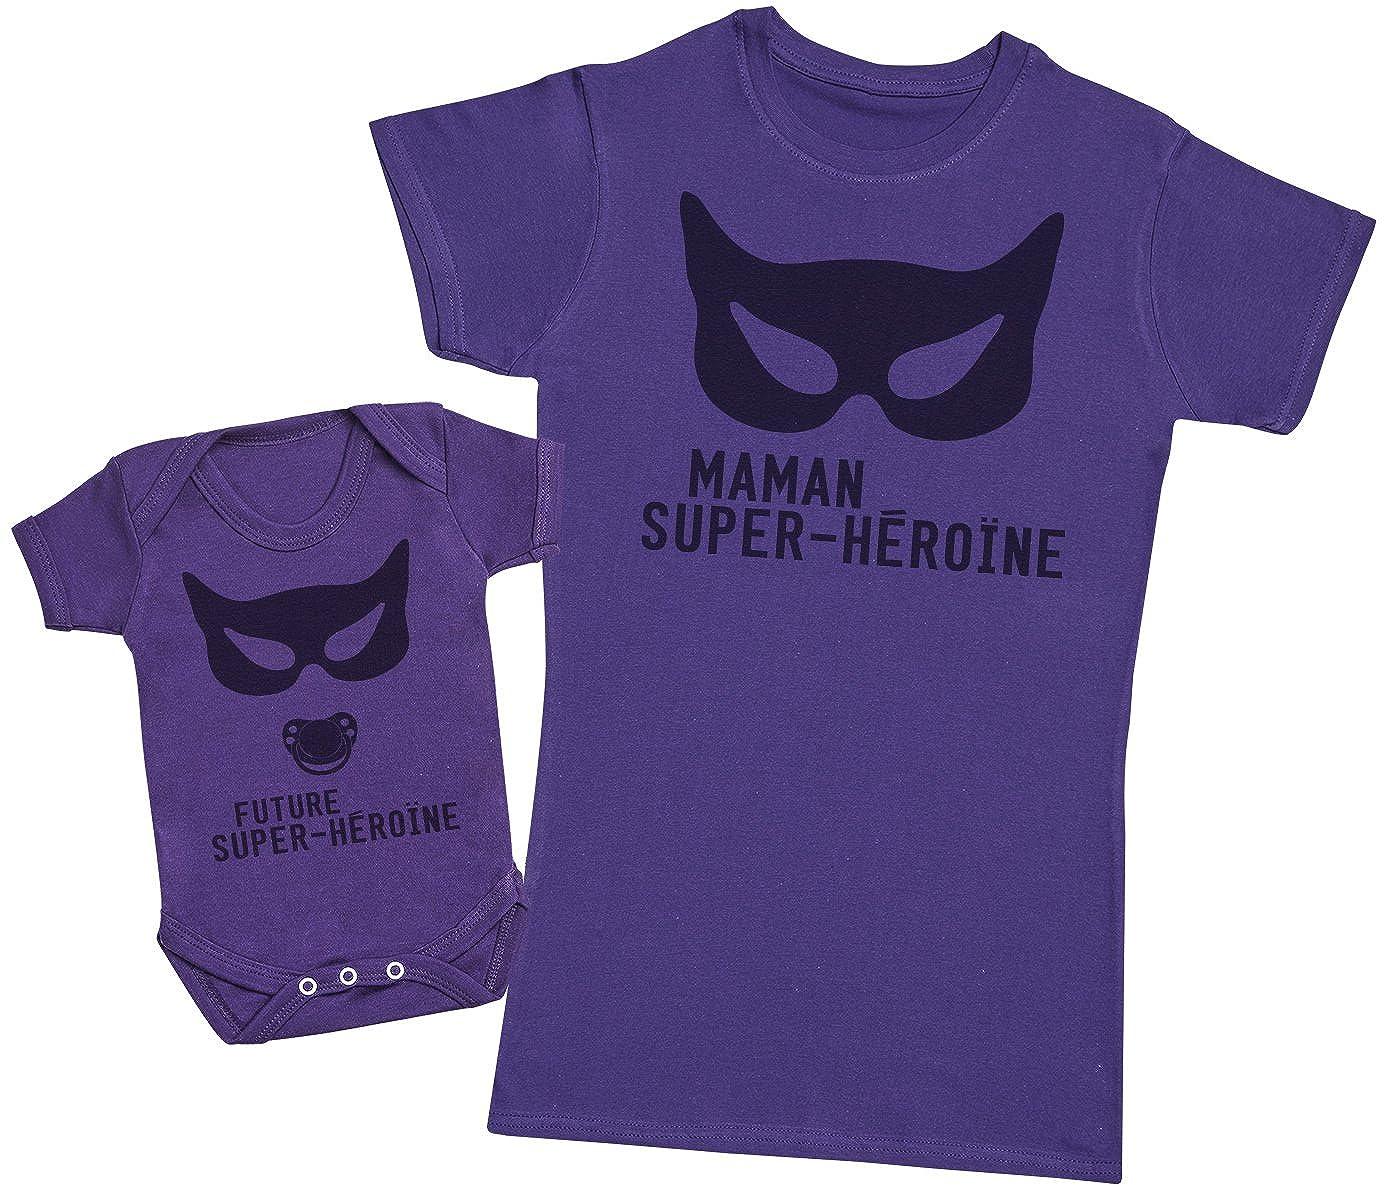 Femme T Shirt /& b/éb/é bodys Future Super-H/éro/ïne /& Maman Super-H/éro/ïne Ensemble M/ère B/éb/é Cadeau